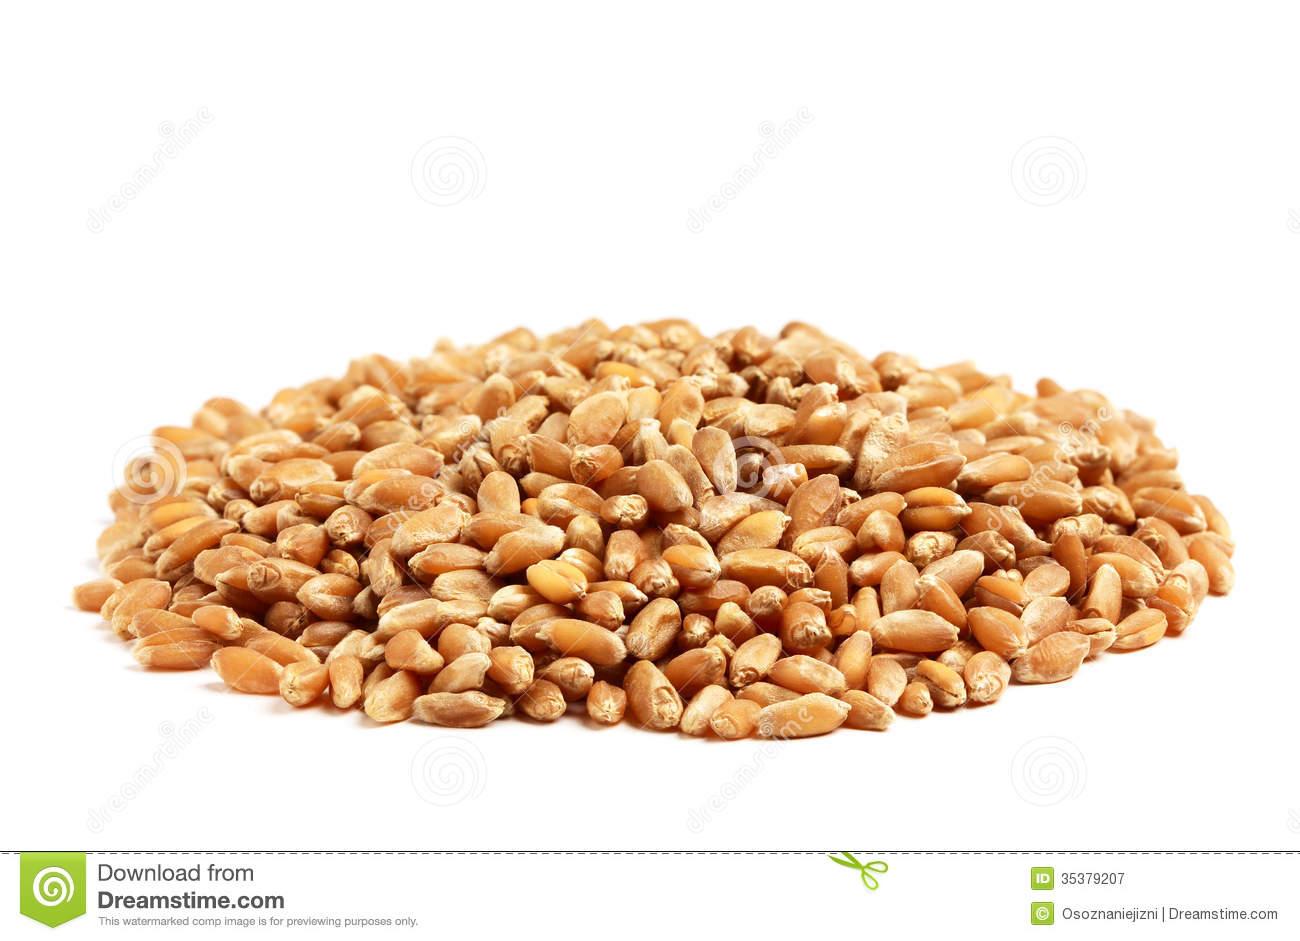 Grains Food Group Clipart - Clipart Suggest